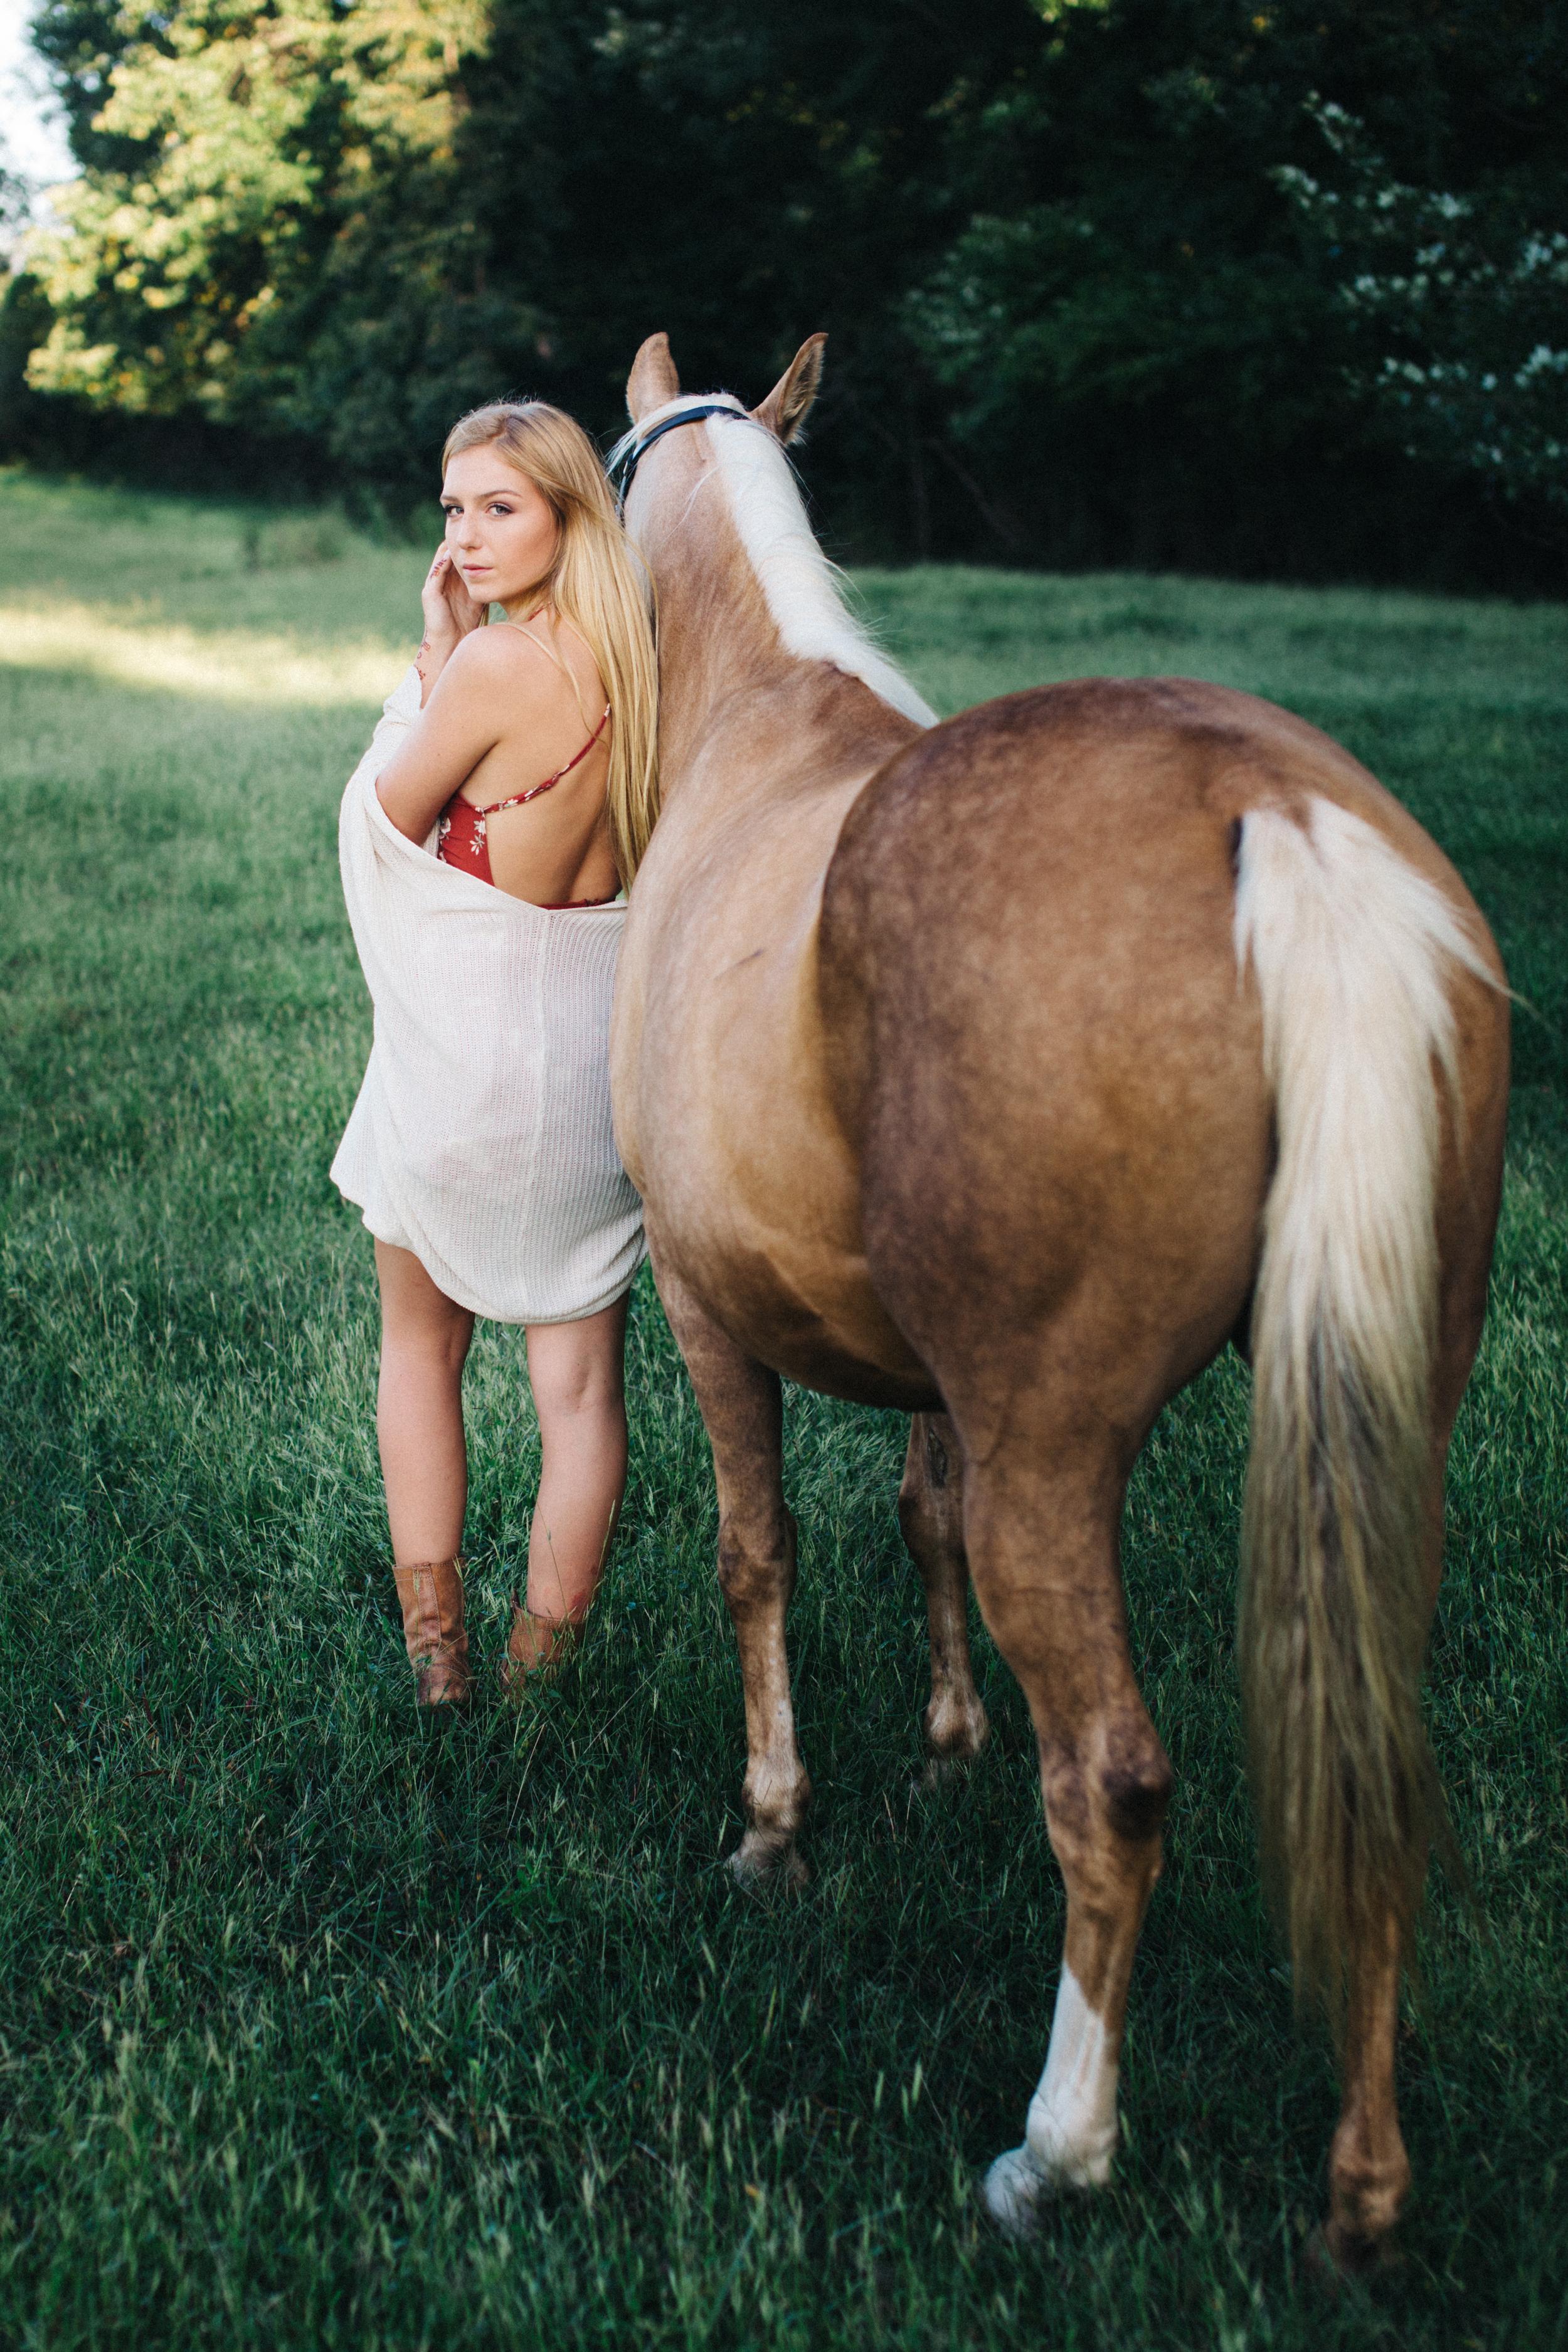 annapolis-maryland-senior-portrait-session-photographer-boho-horse-inspo-emma-jean-photography-7-photo.jpg